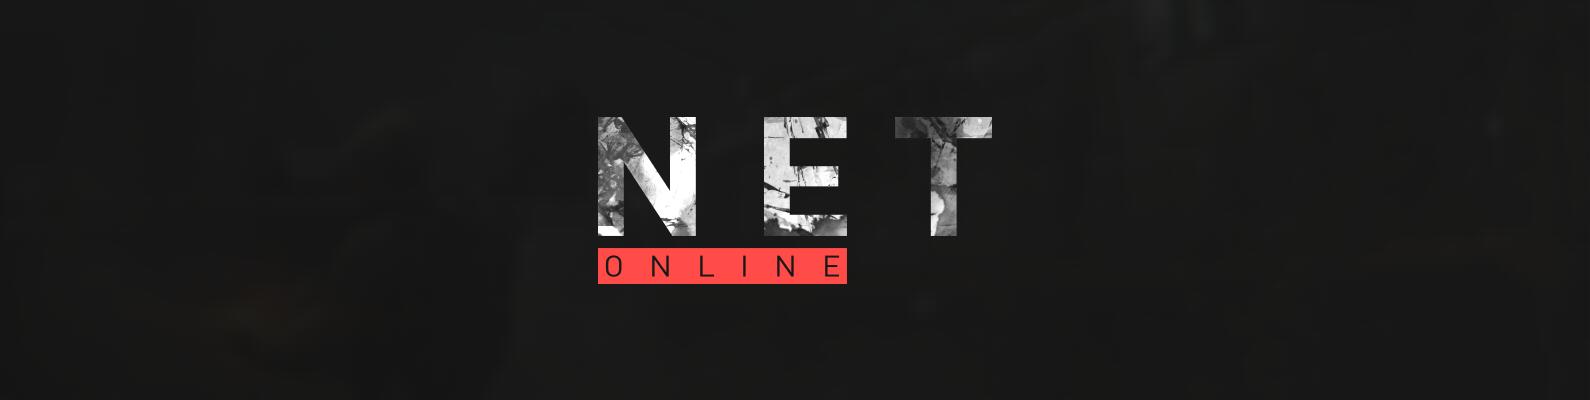 Интерфейс - S.T.A.L.K.E.R. NET ONLINE